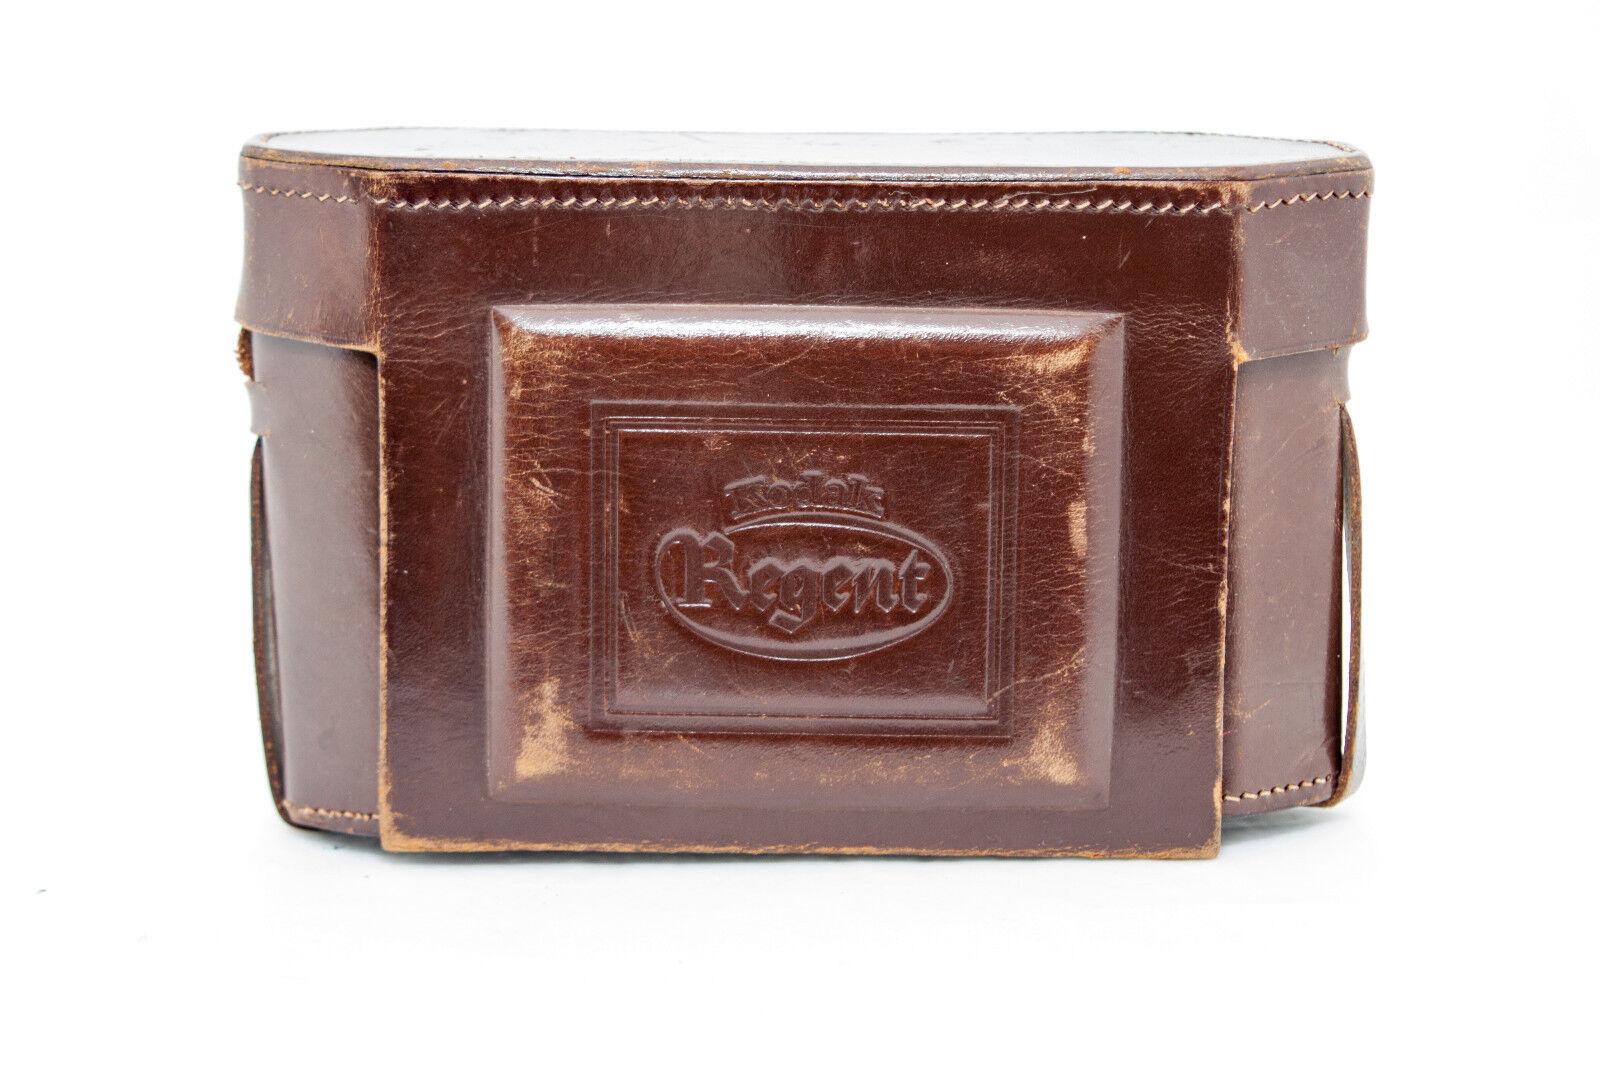 Kodak Regent Cuero Bolso Específico brown  Selten-Rare